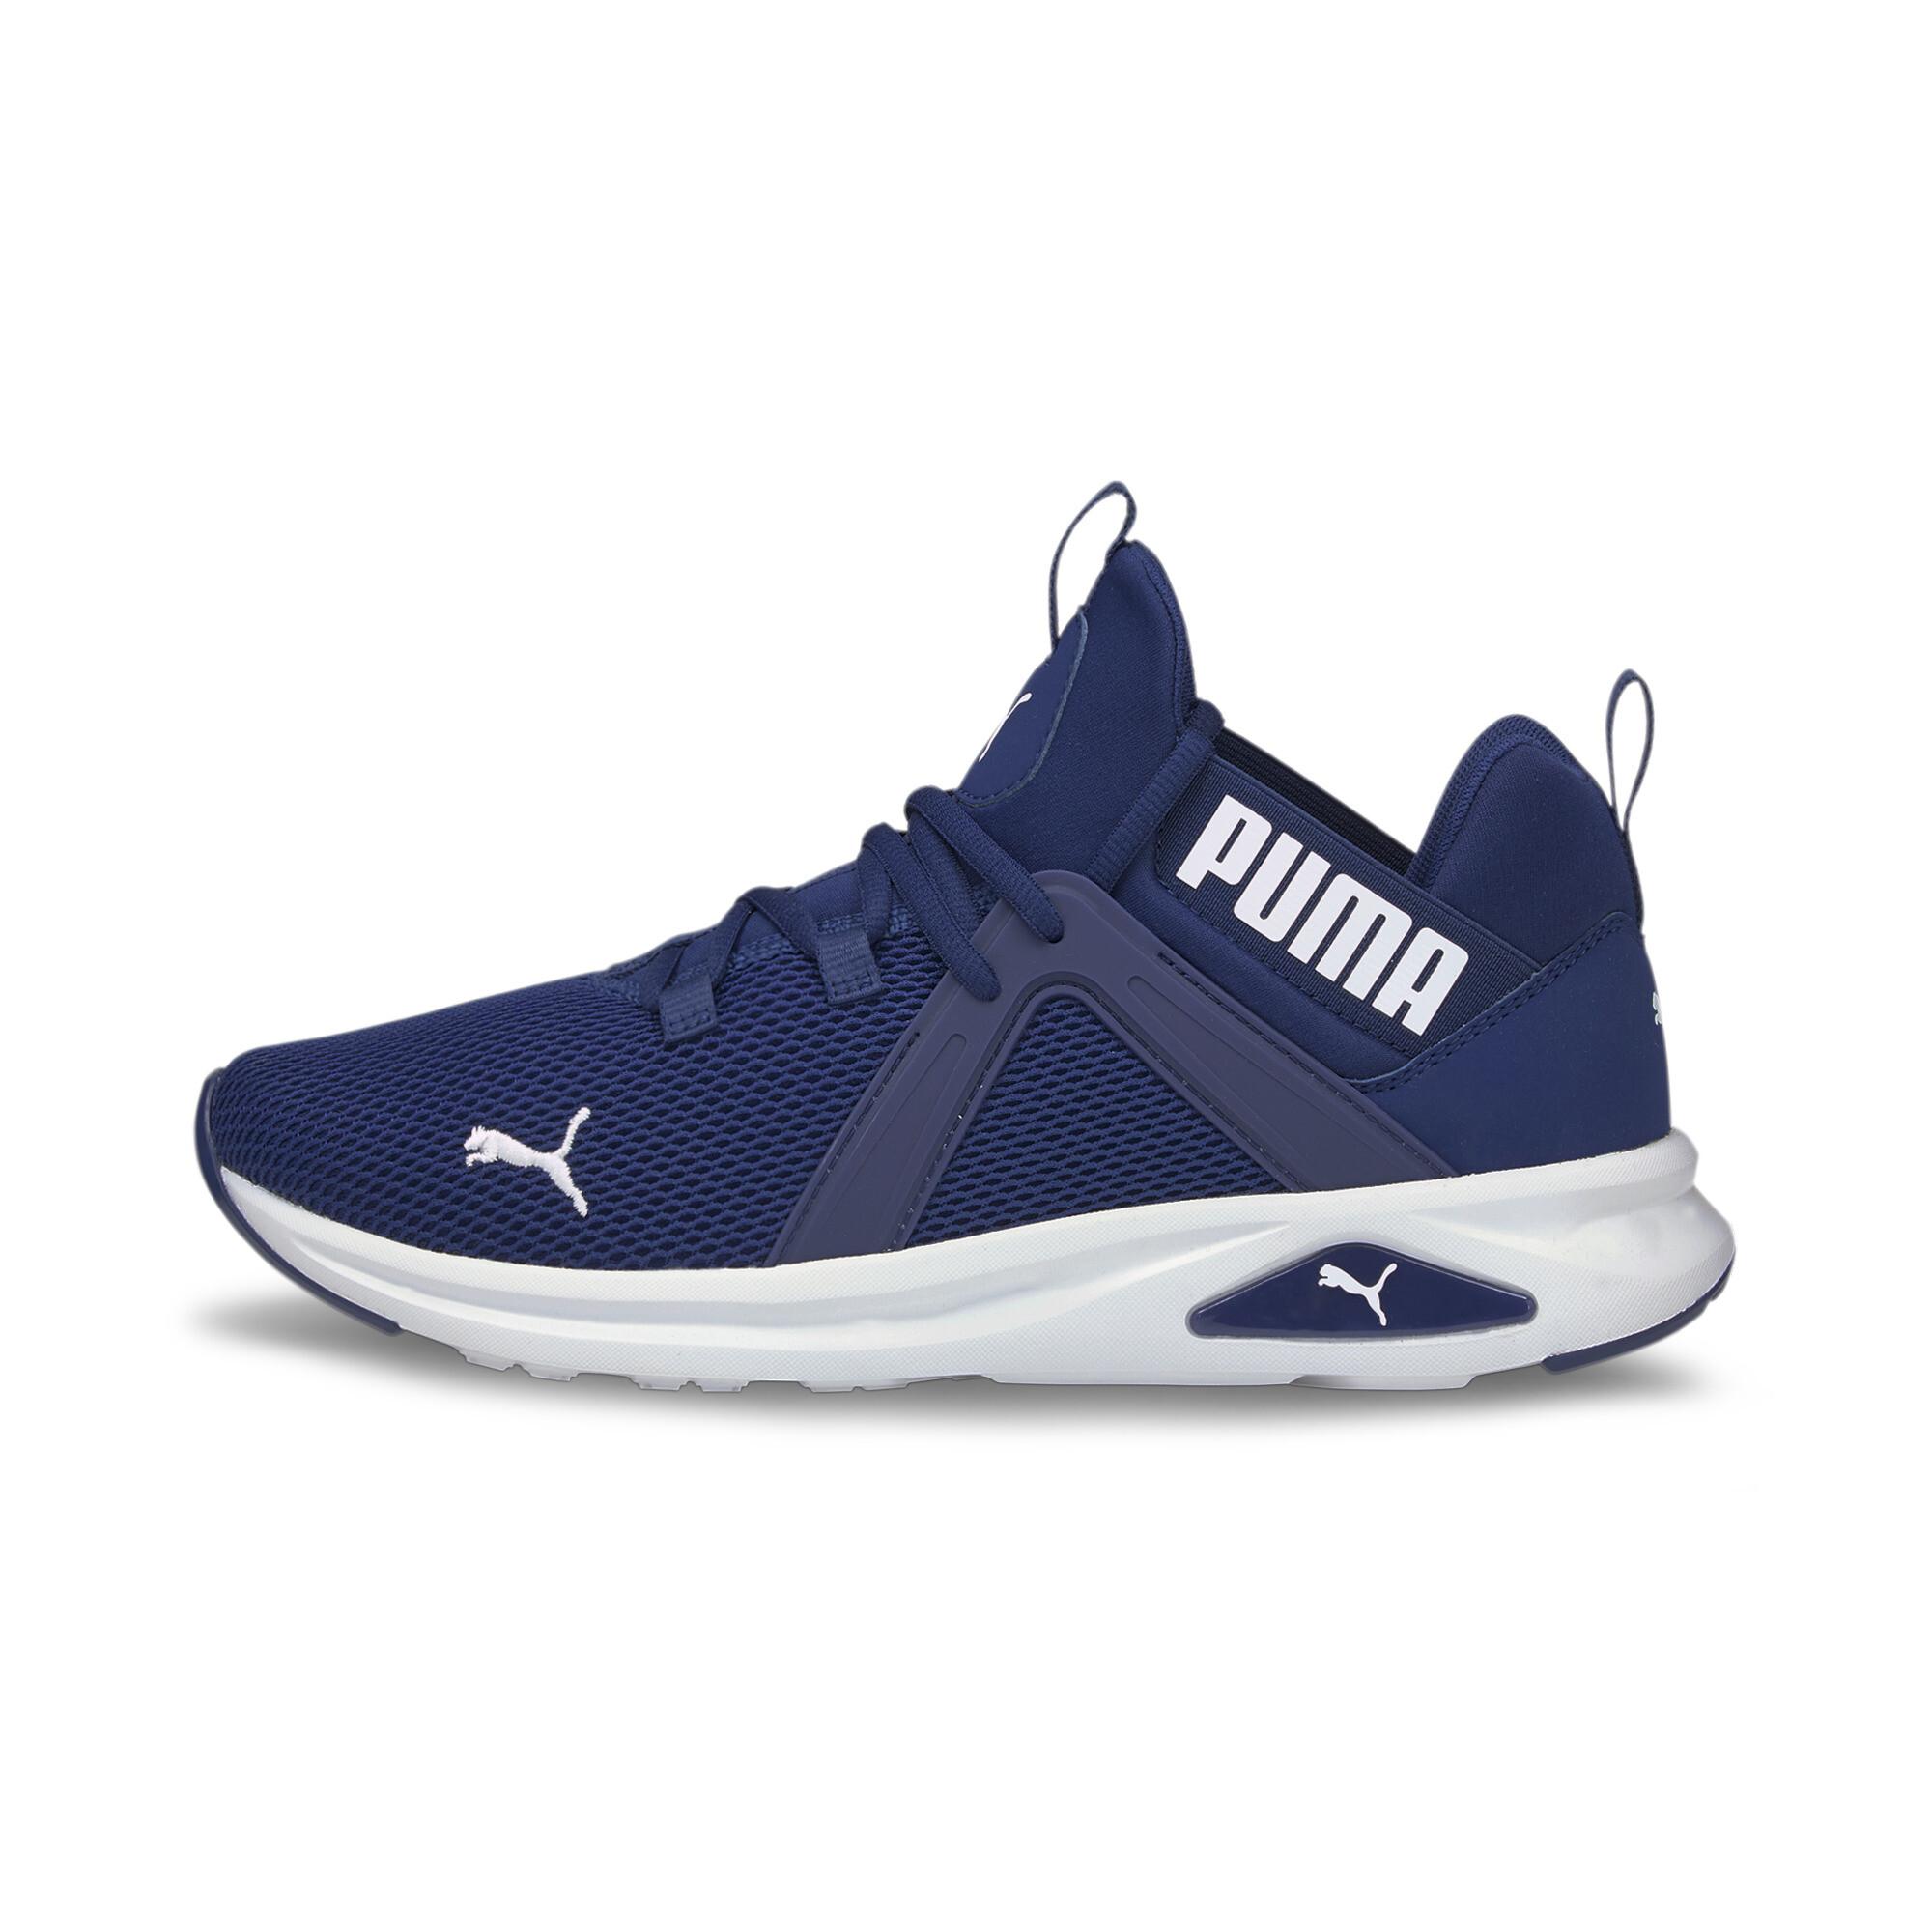 thumbnail 55 - PUMA Men's Enzo 2 Training Shoes